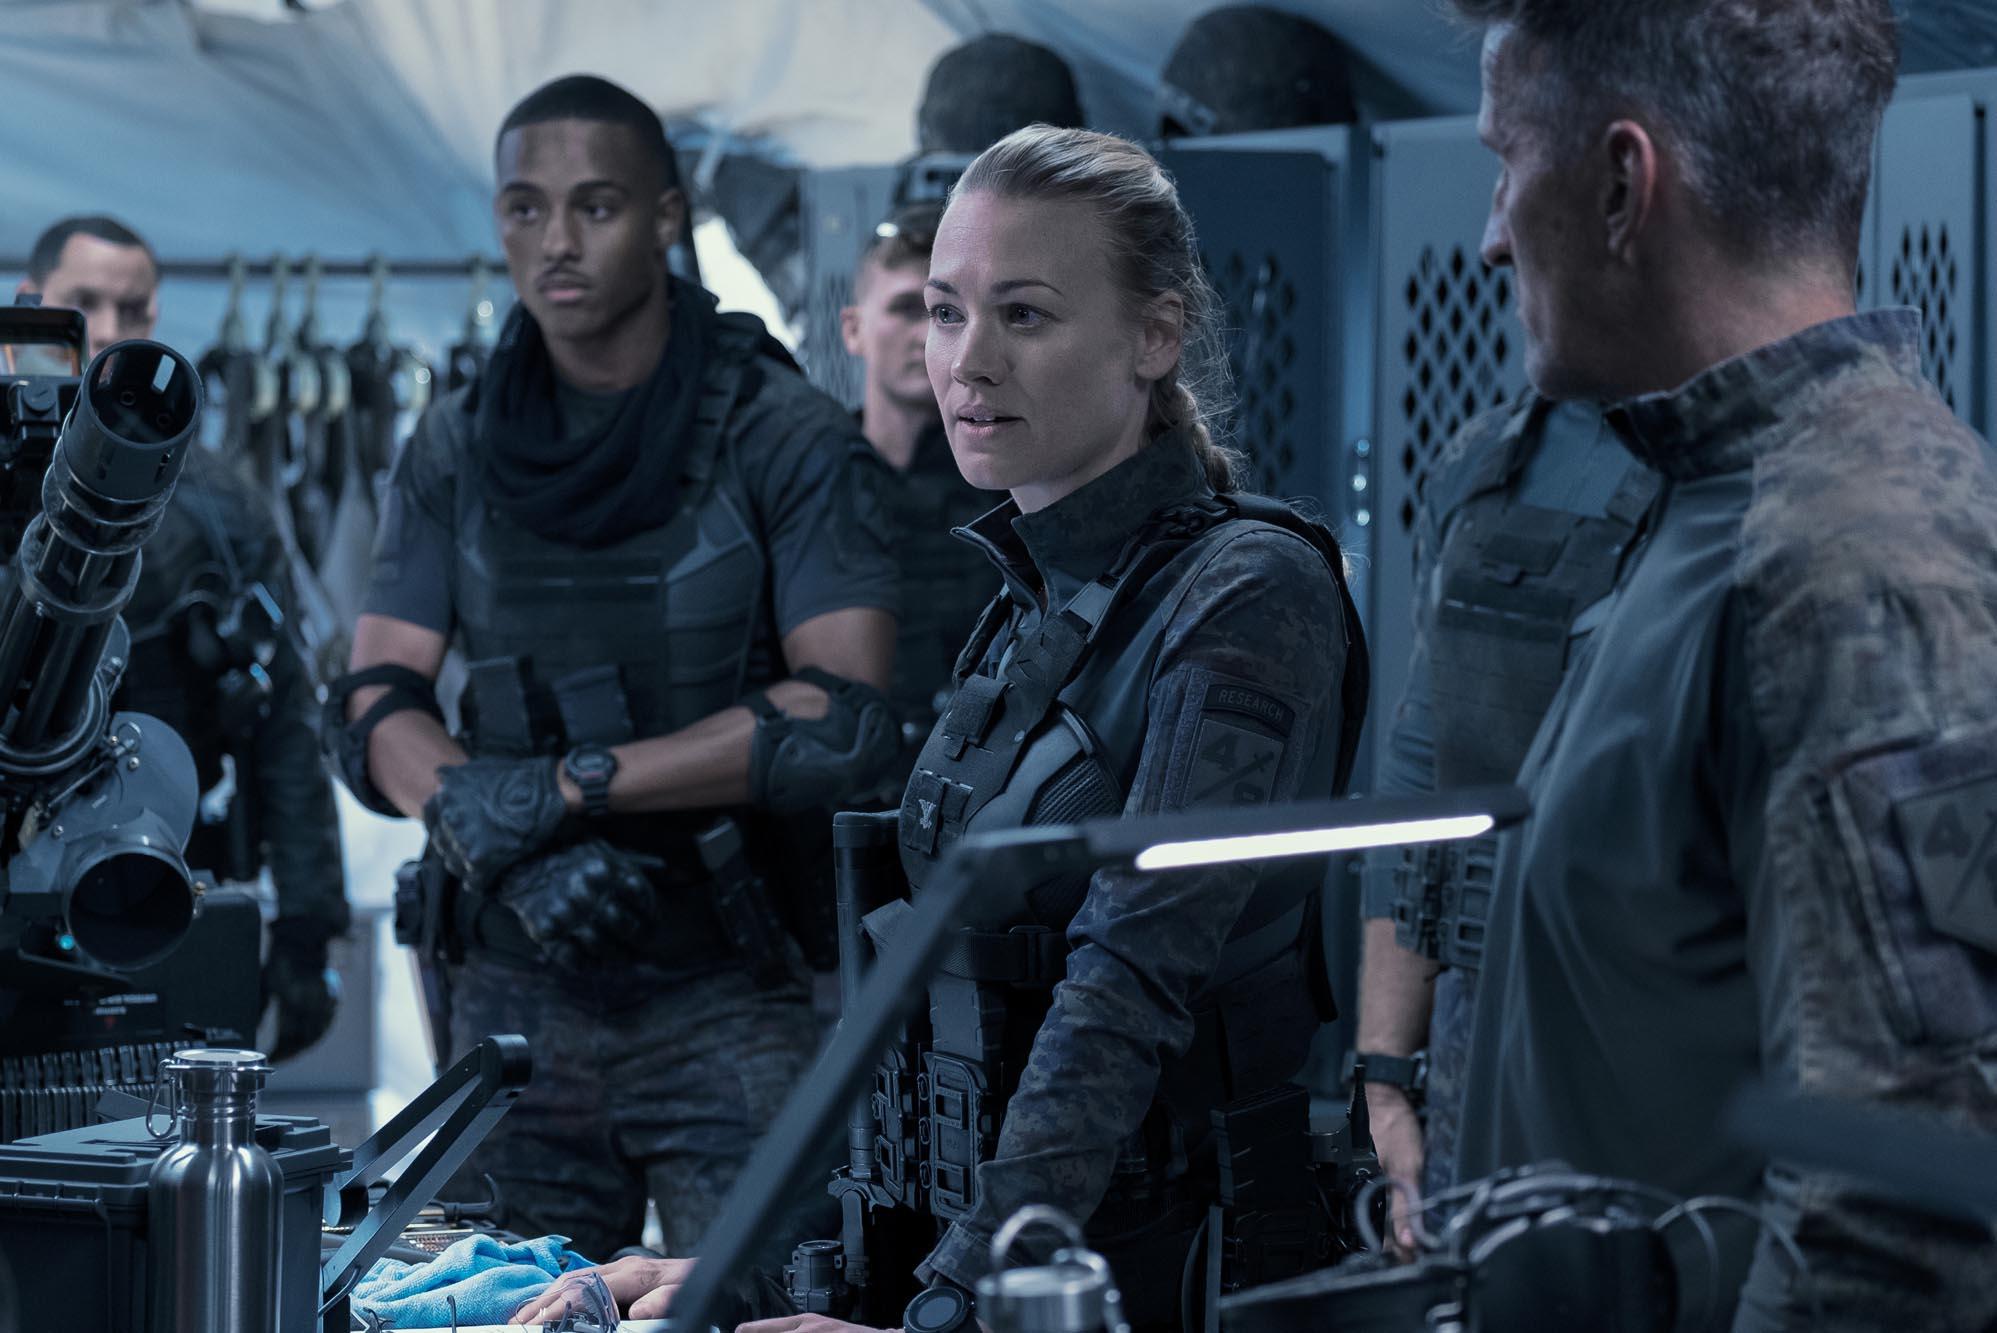 'The Tomorrow War' Movie Review: The Best Part Was Yvonne Strahovski